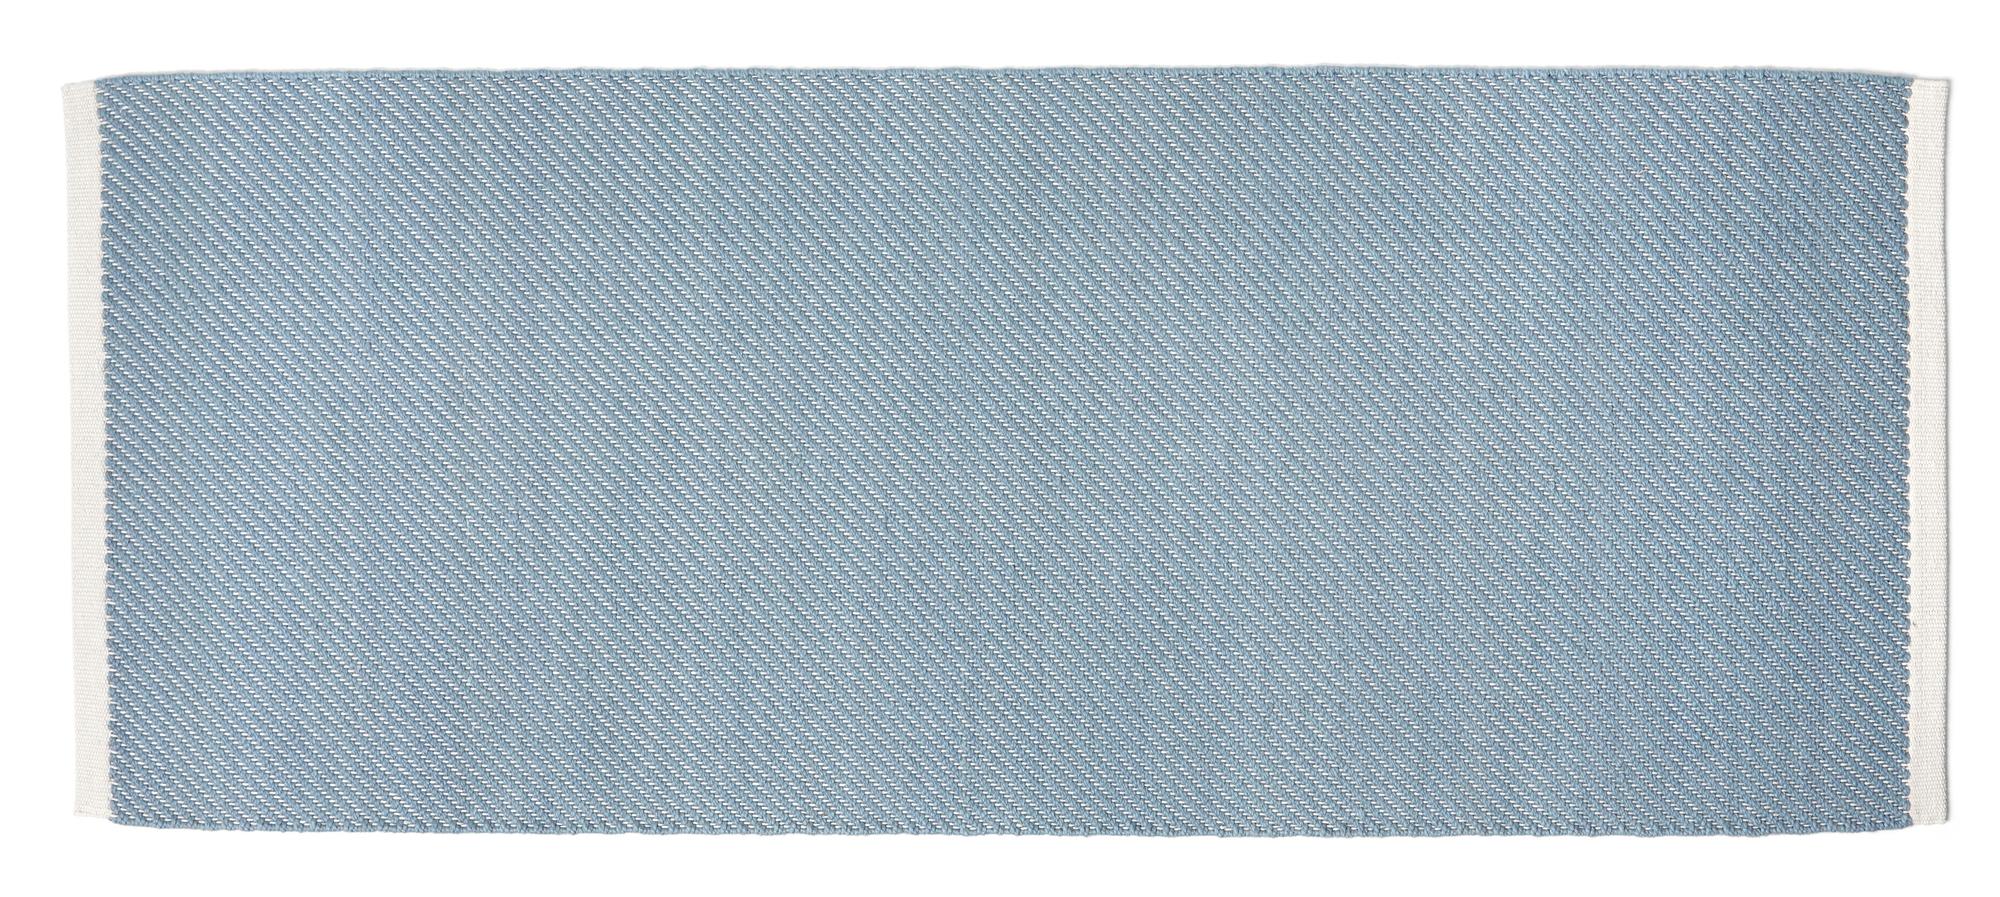 Bias rug Carpet Hay B 80 Cool grey